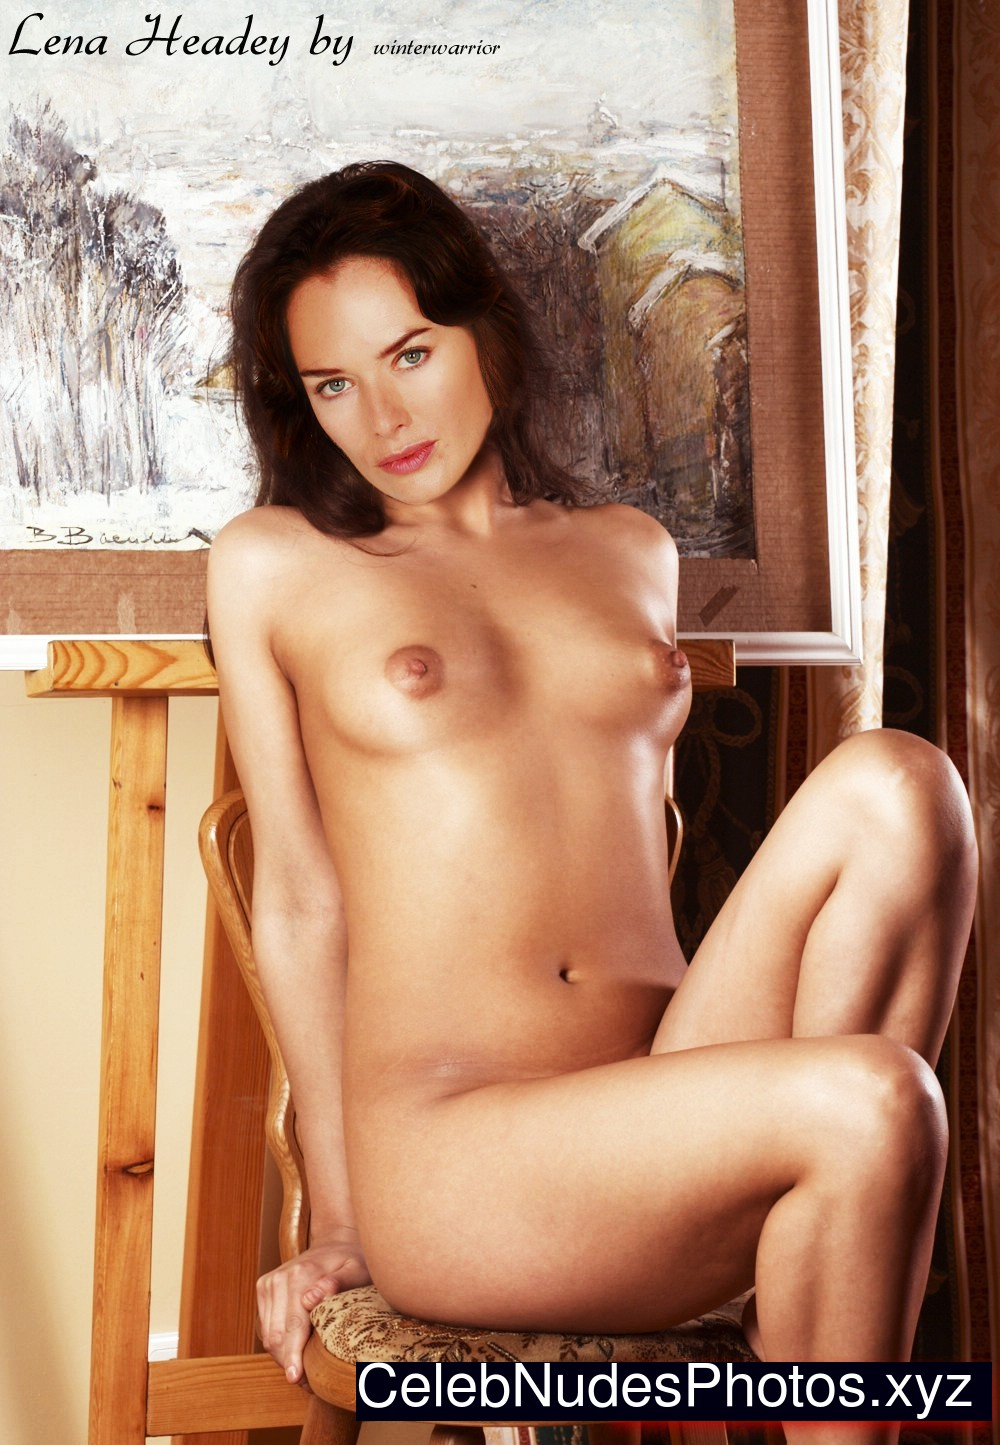 Lena Headey nude celebs